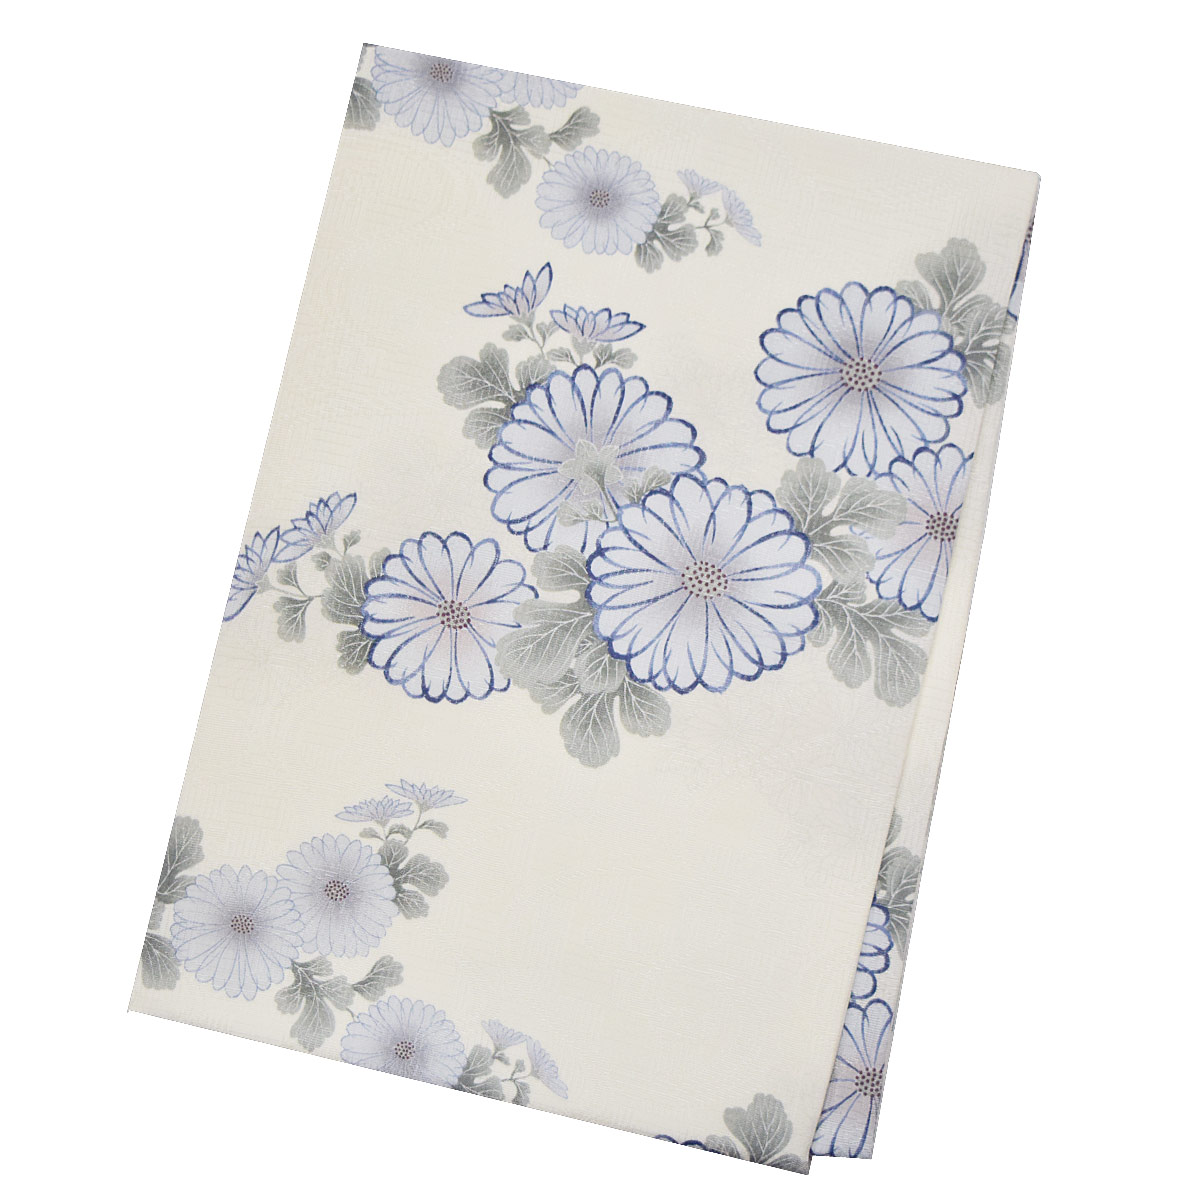 青 花柄番号d521-7 着物 夏 名古屋帯九寸 仕立て上がり 白 【夏】正絹